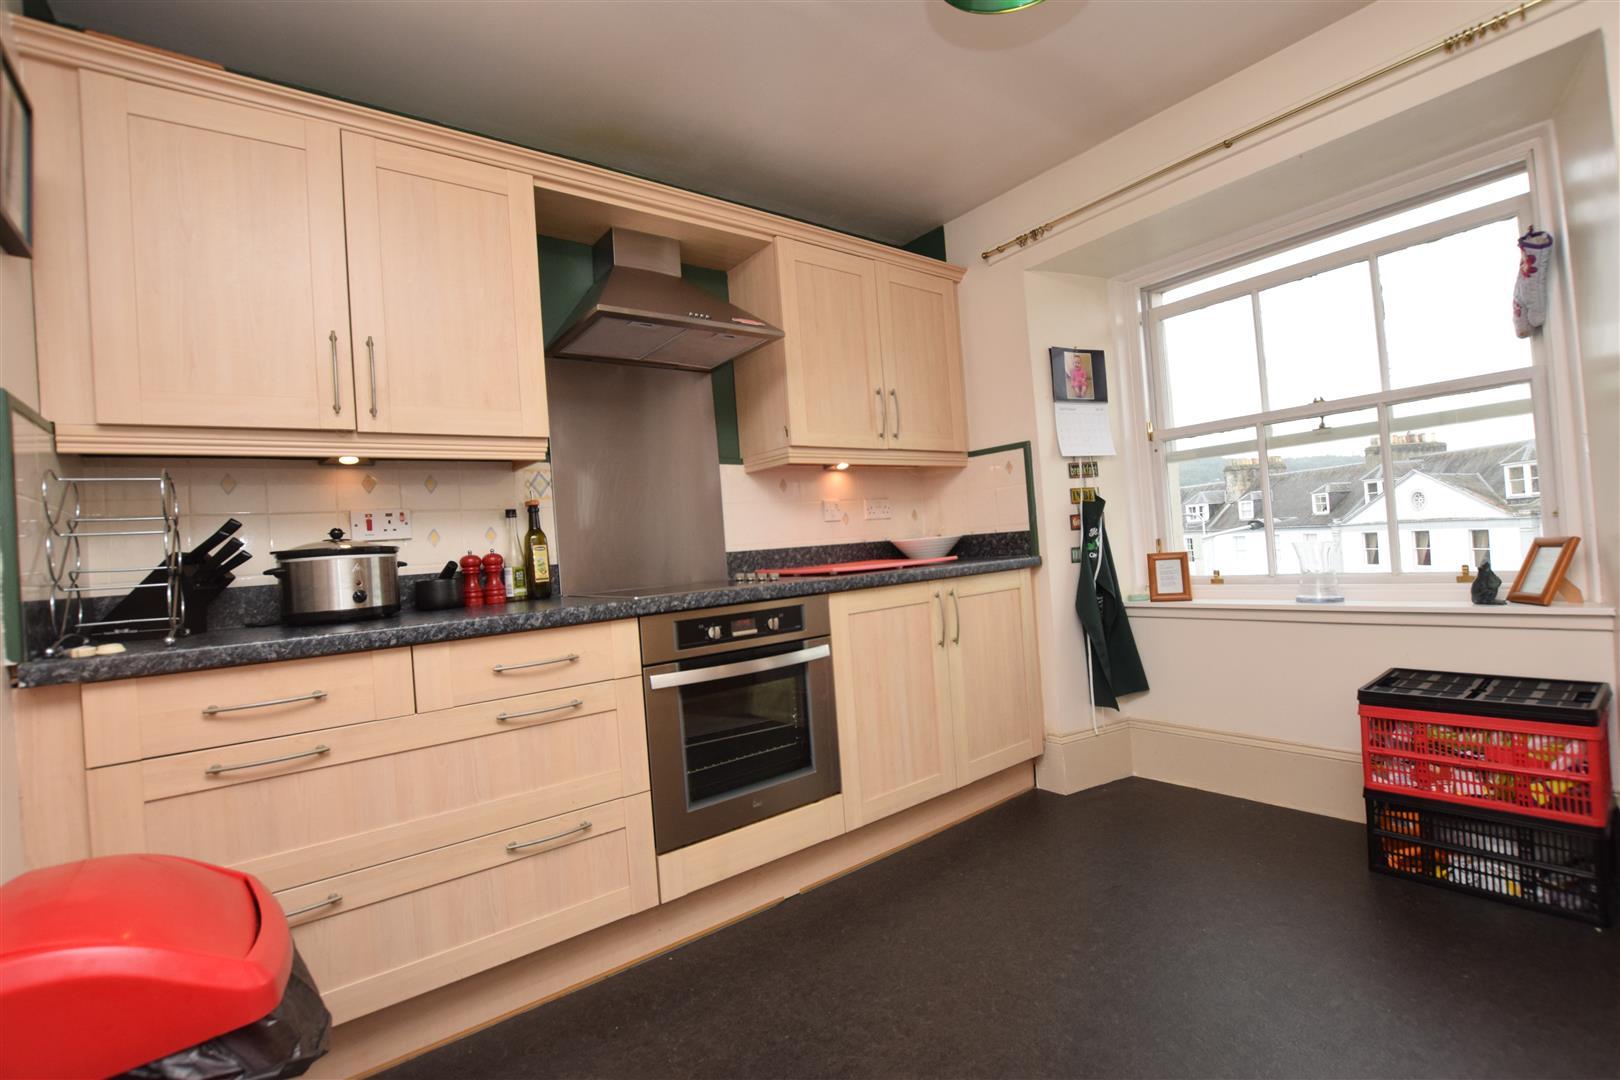 Flat 6, 2 Atholl Street, Perth, Perthshire, PH1 5NP, UK